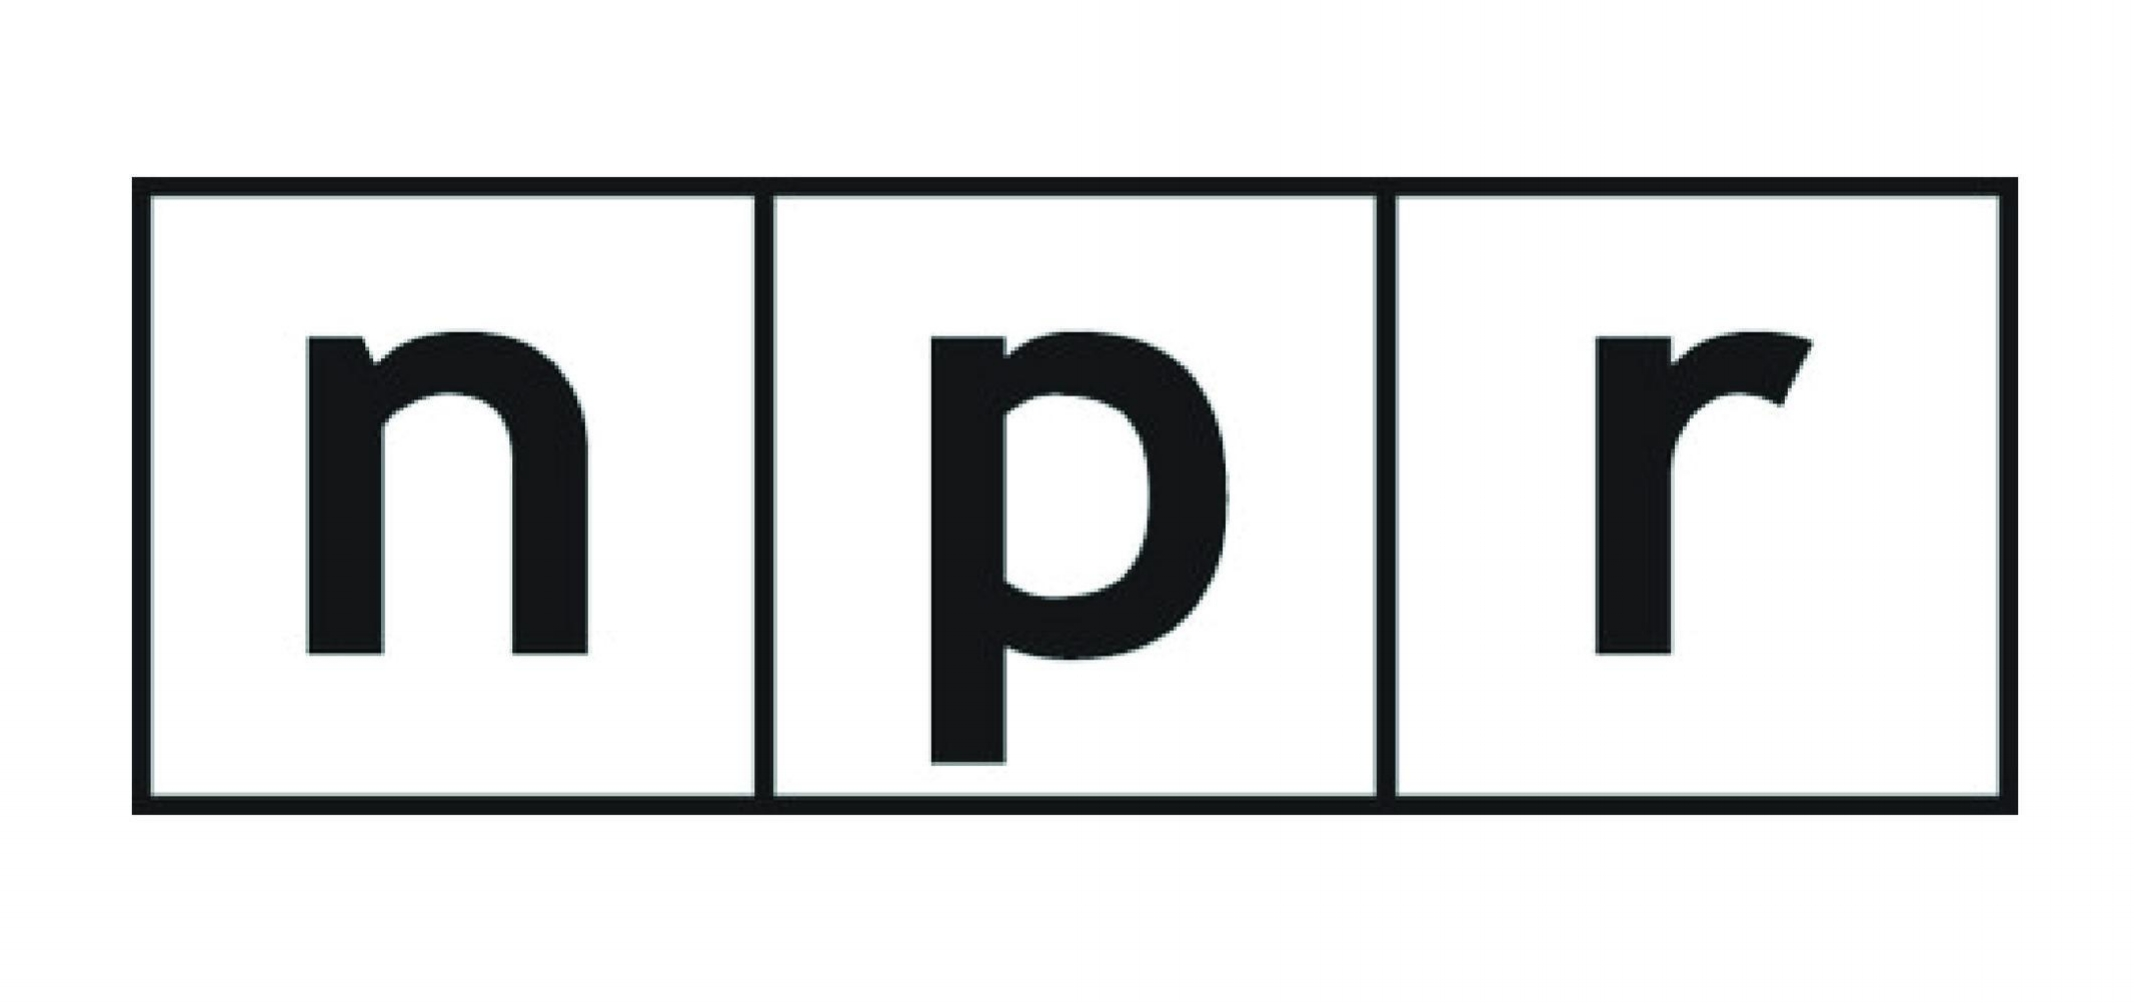 NPR Cover Image-01.jpg